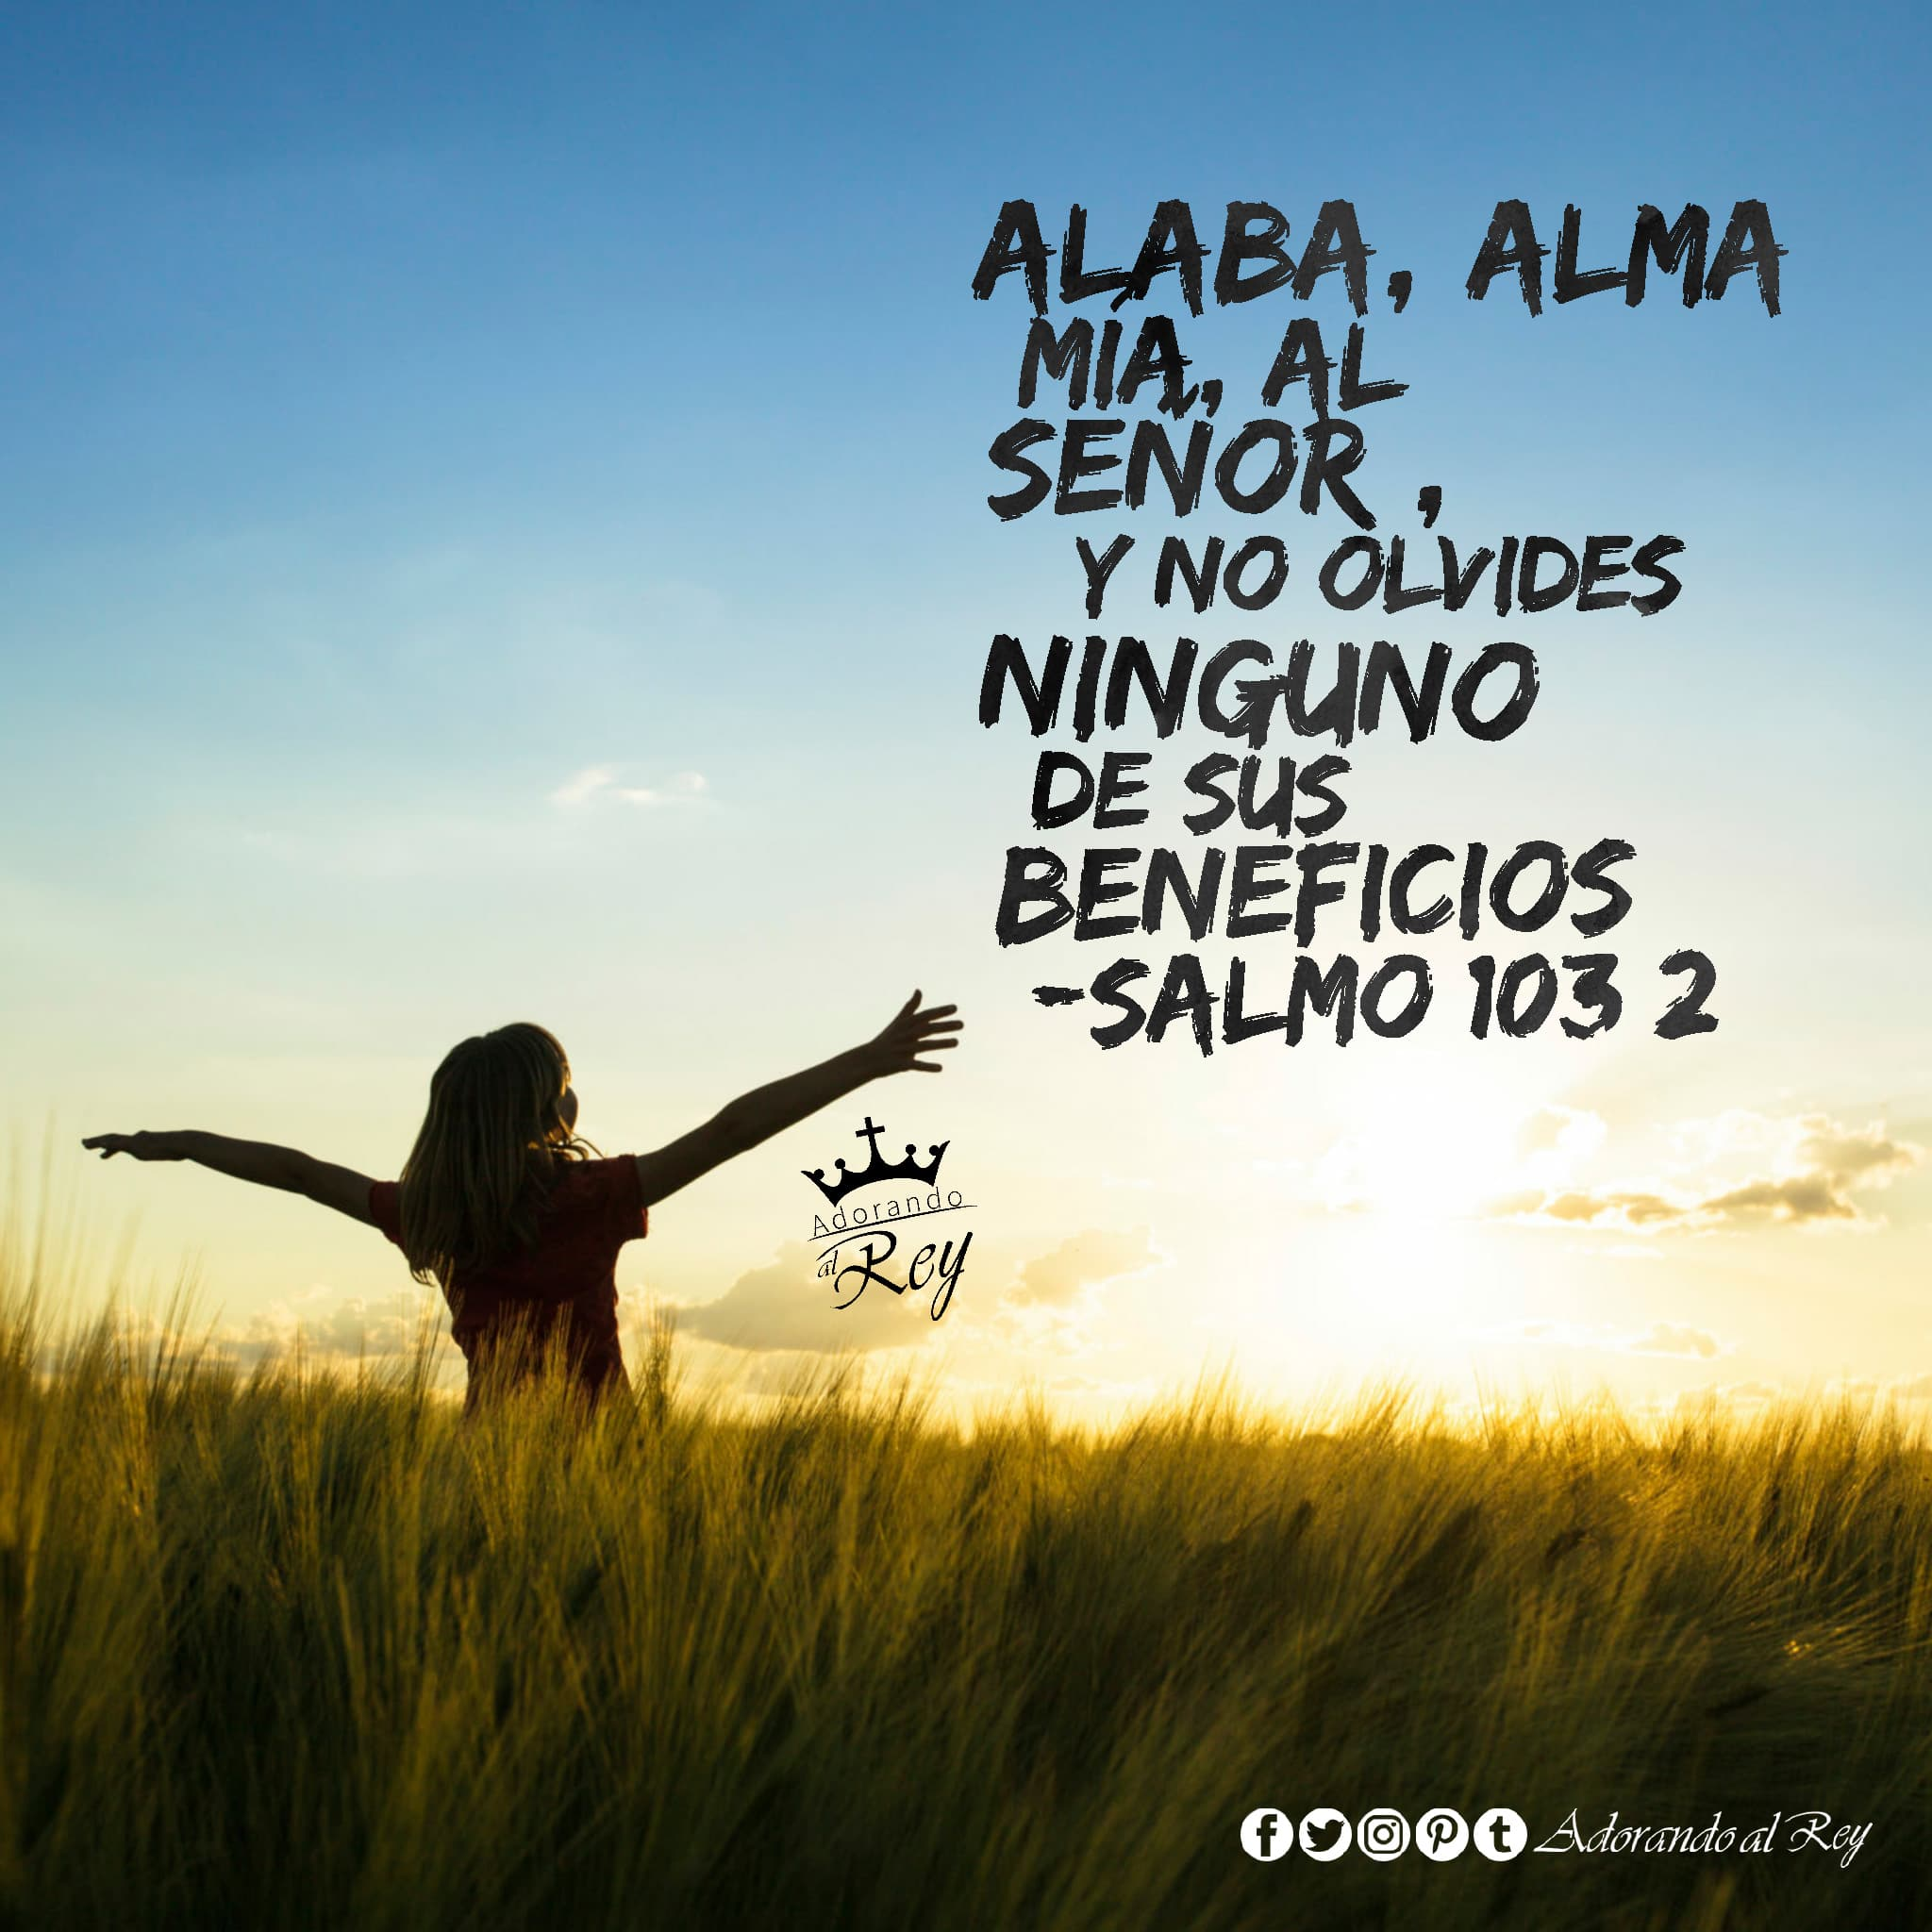 Salmo 103:2